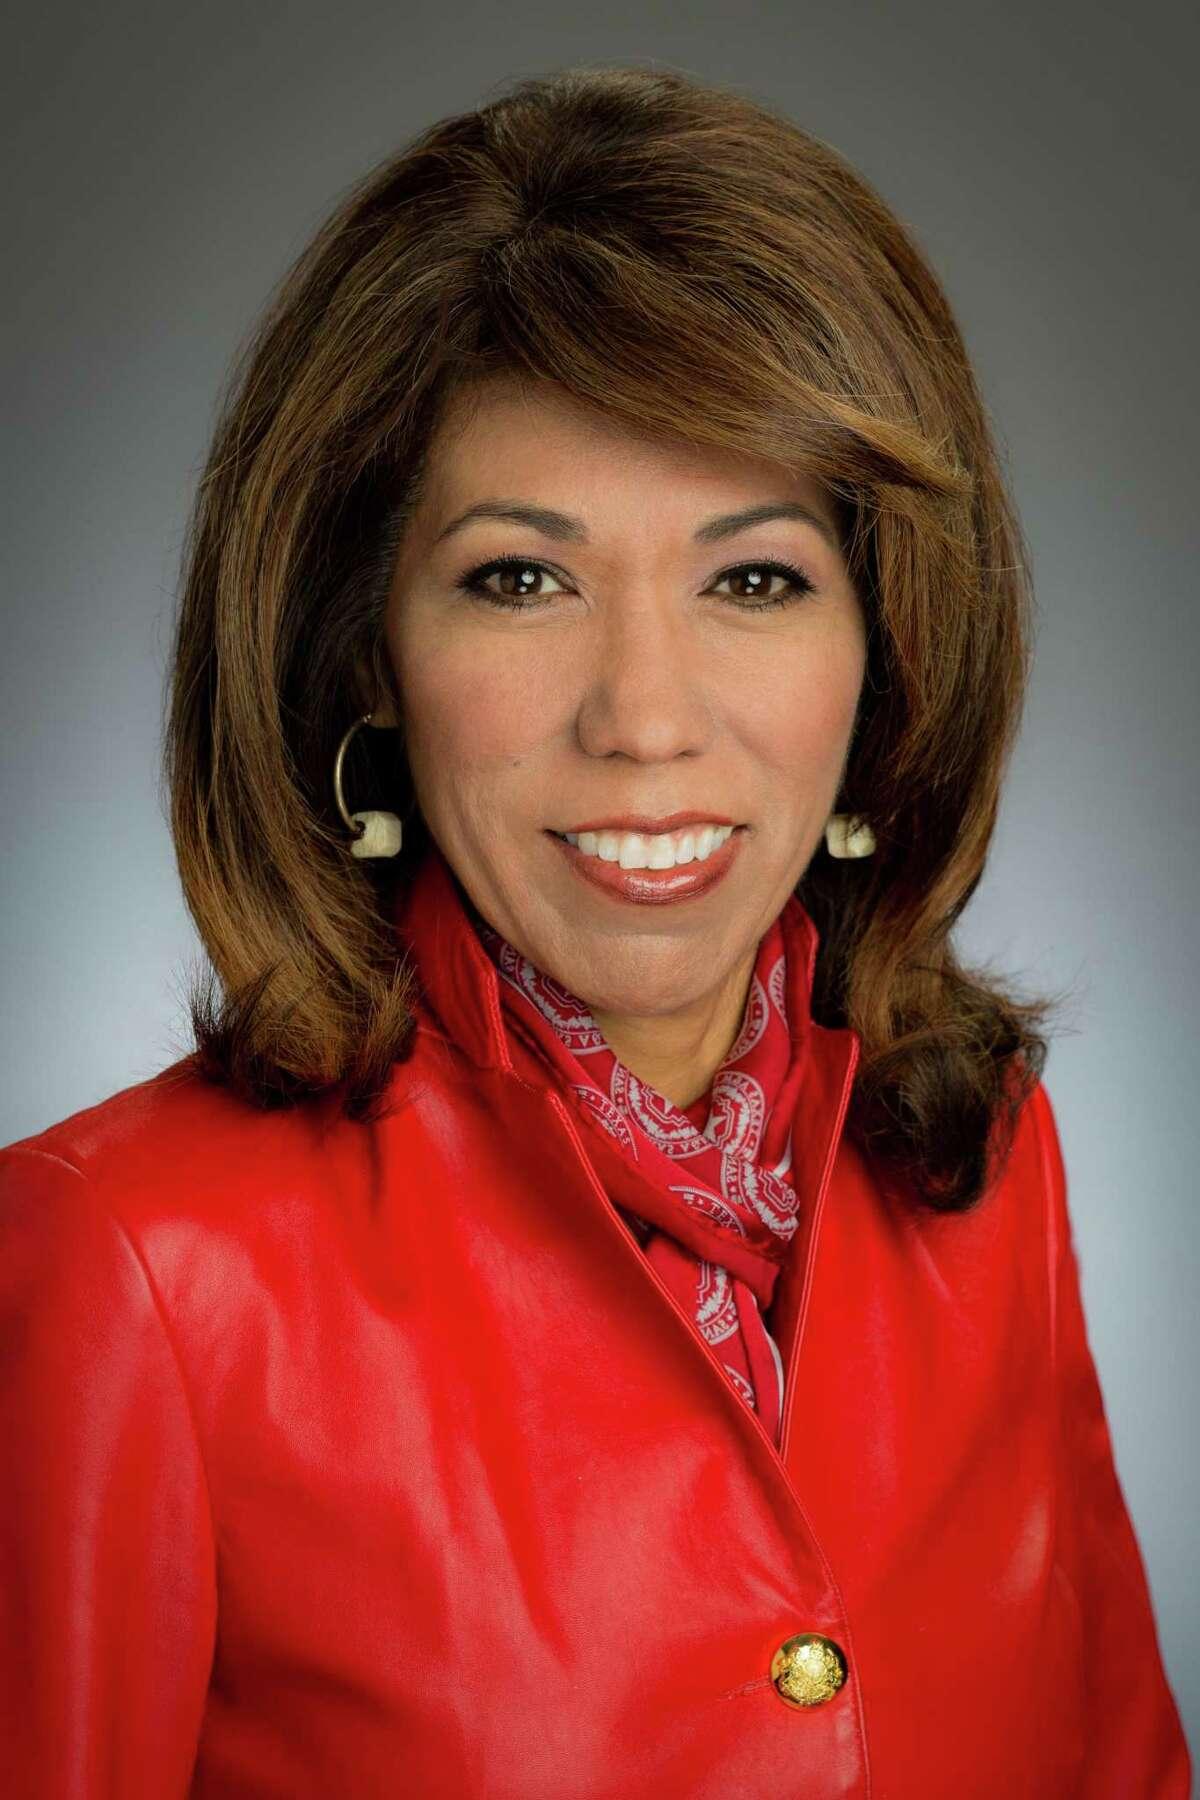 Cynthia Teniente-Matson, Ed.D is president of Texas A&M University-San Antonio.